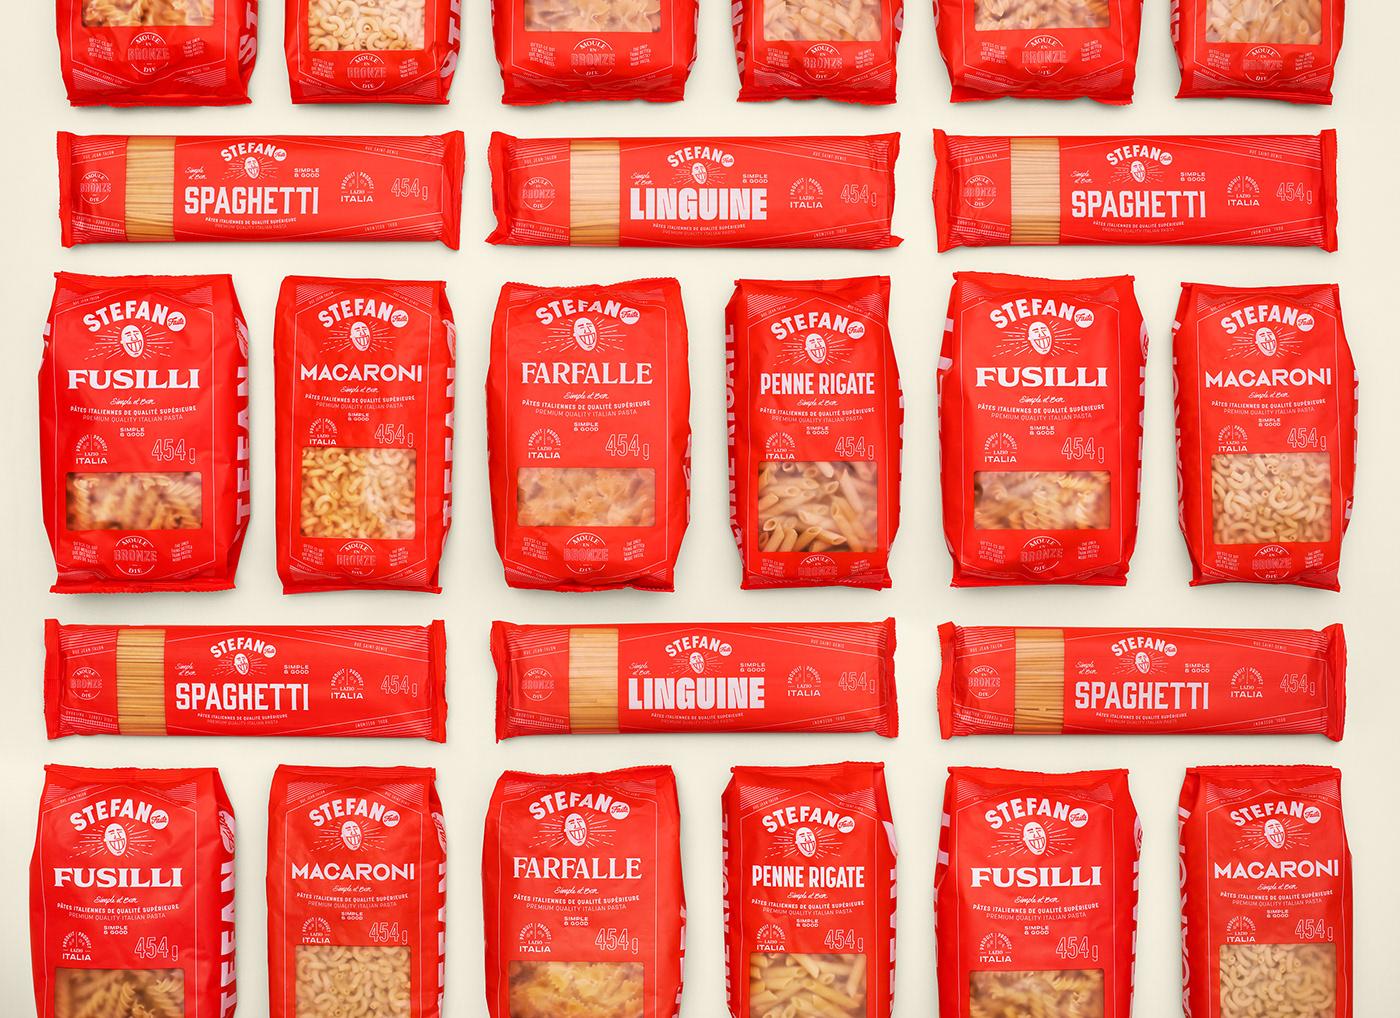 Packaging jar tomato sauce sauce ILLUSTRATION  stefano emballage panettone Pasta Pizza